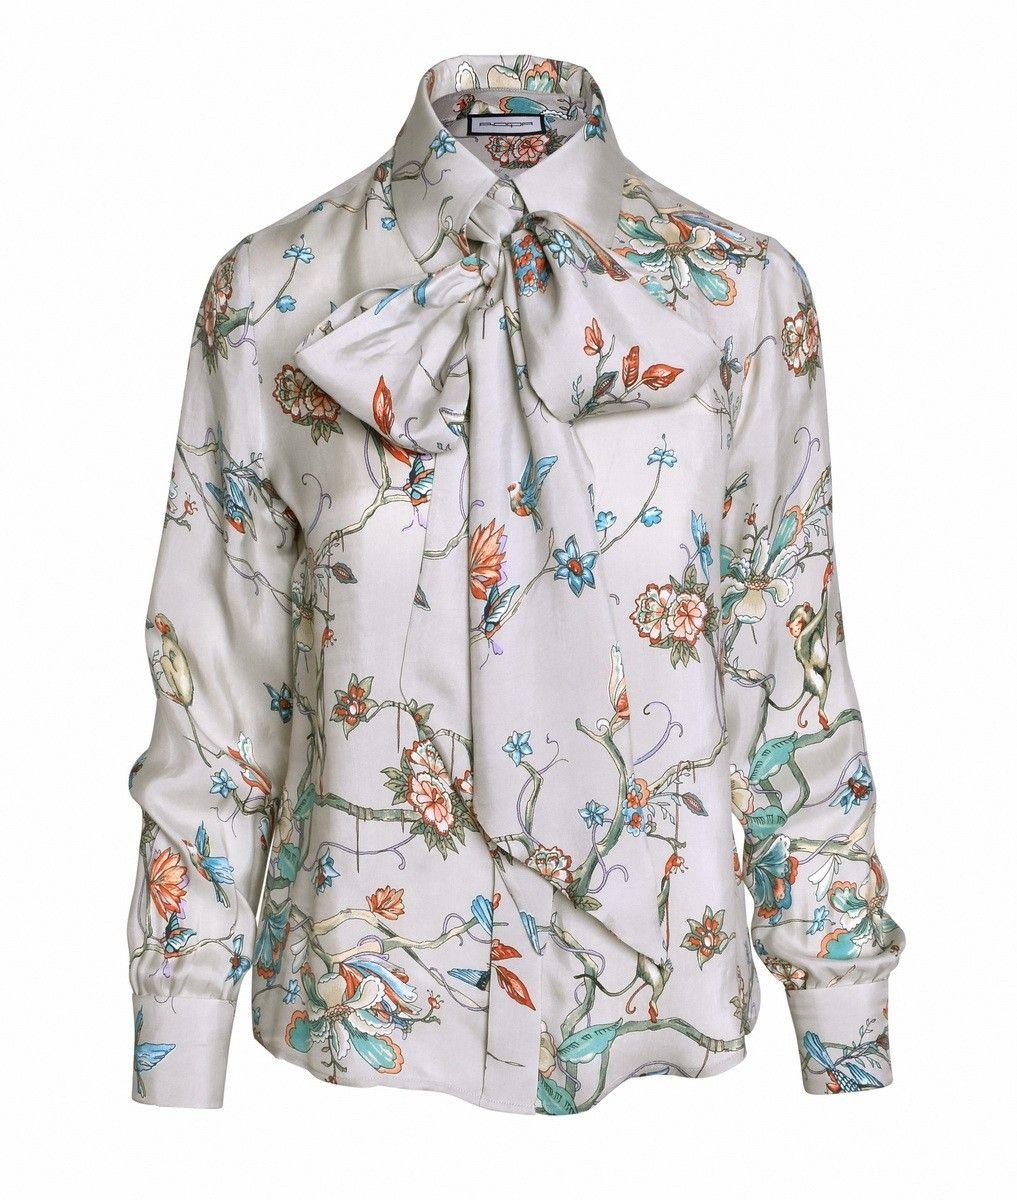 ROQA - Damen Bluse Print - Taupe